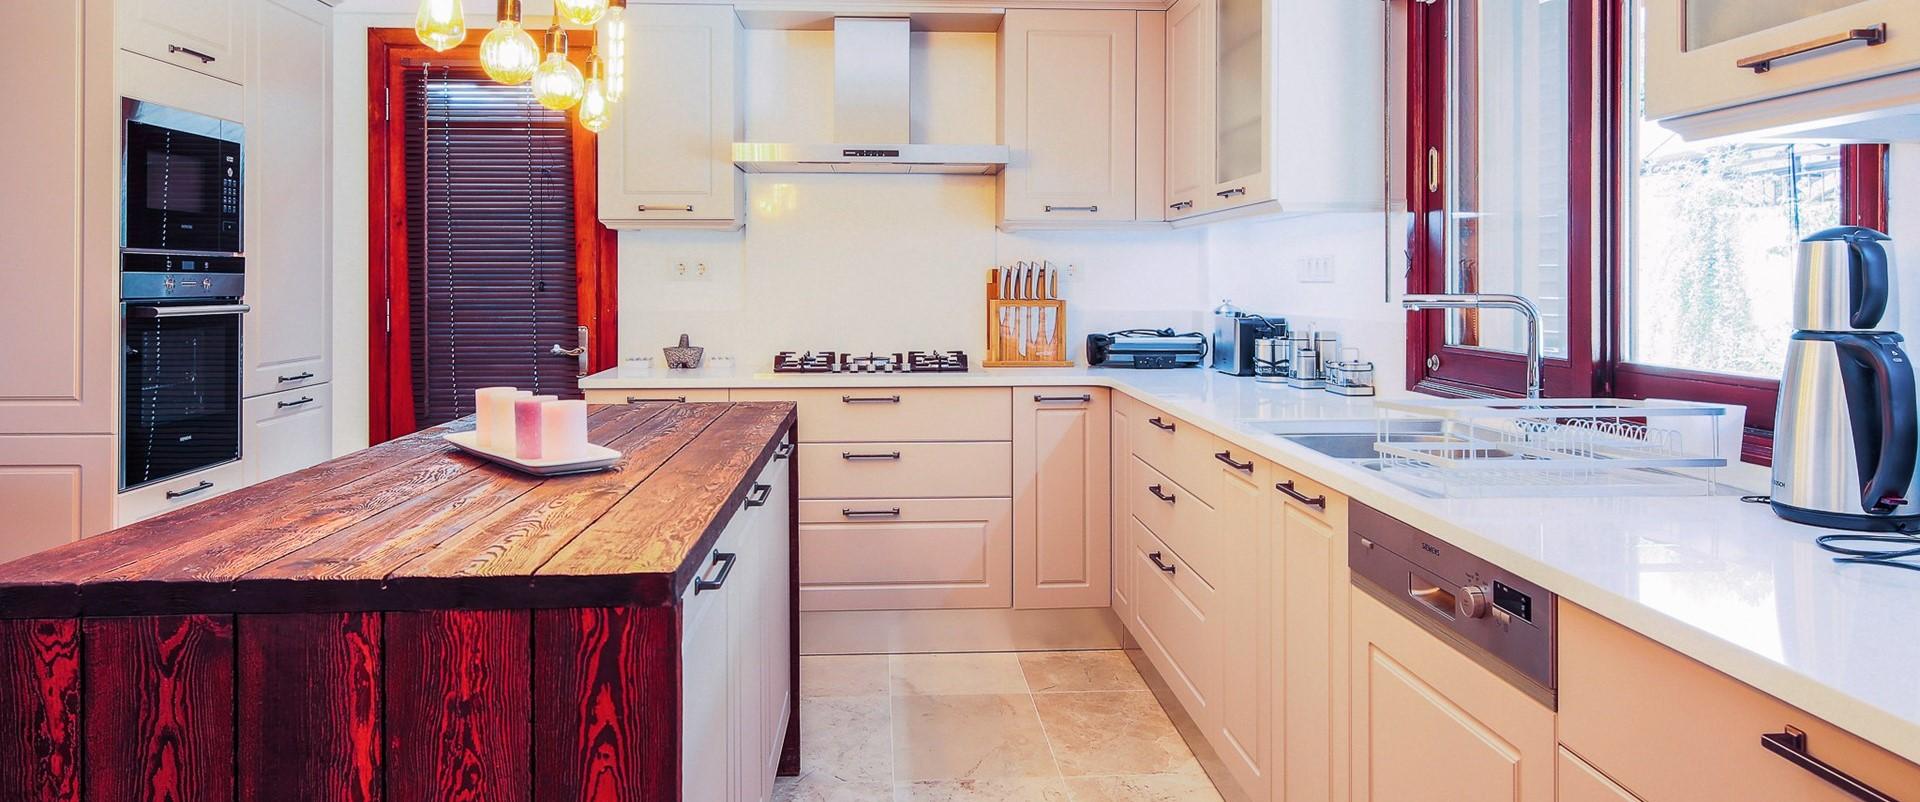 villa-caria-kalkan-kitchen